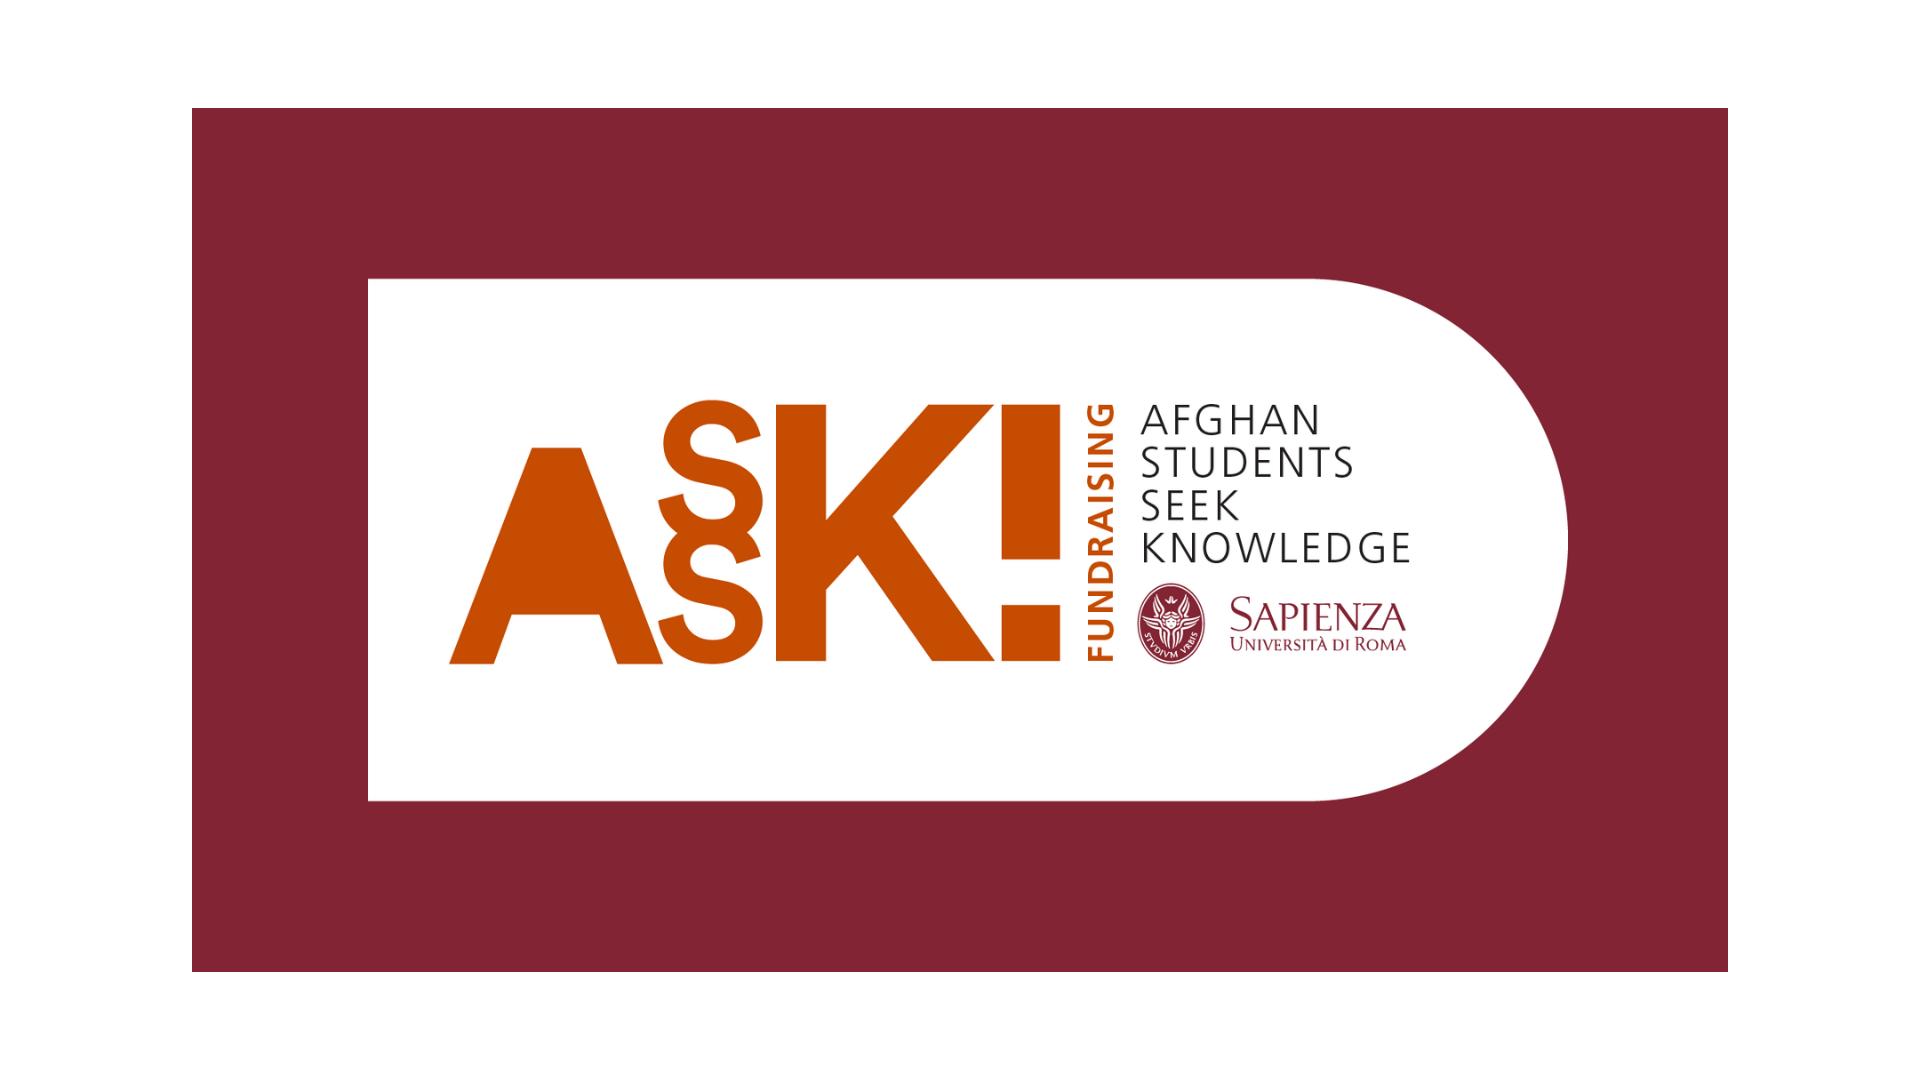 Sapienza Università di Roma, AssK - Afghan Students Seek Knowledge